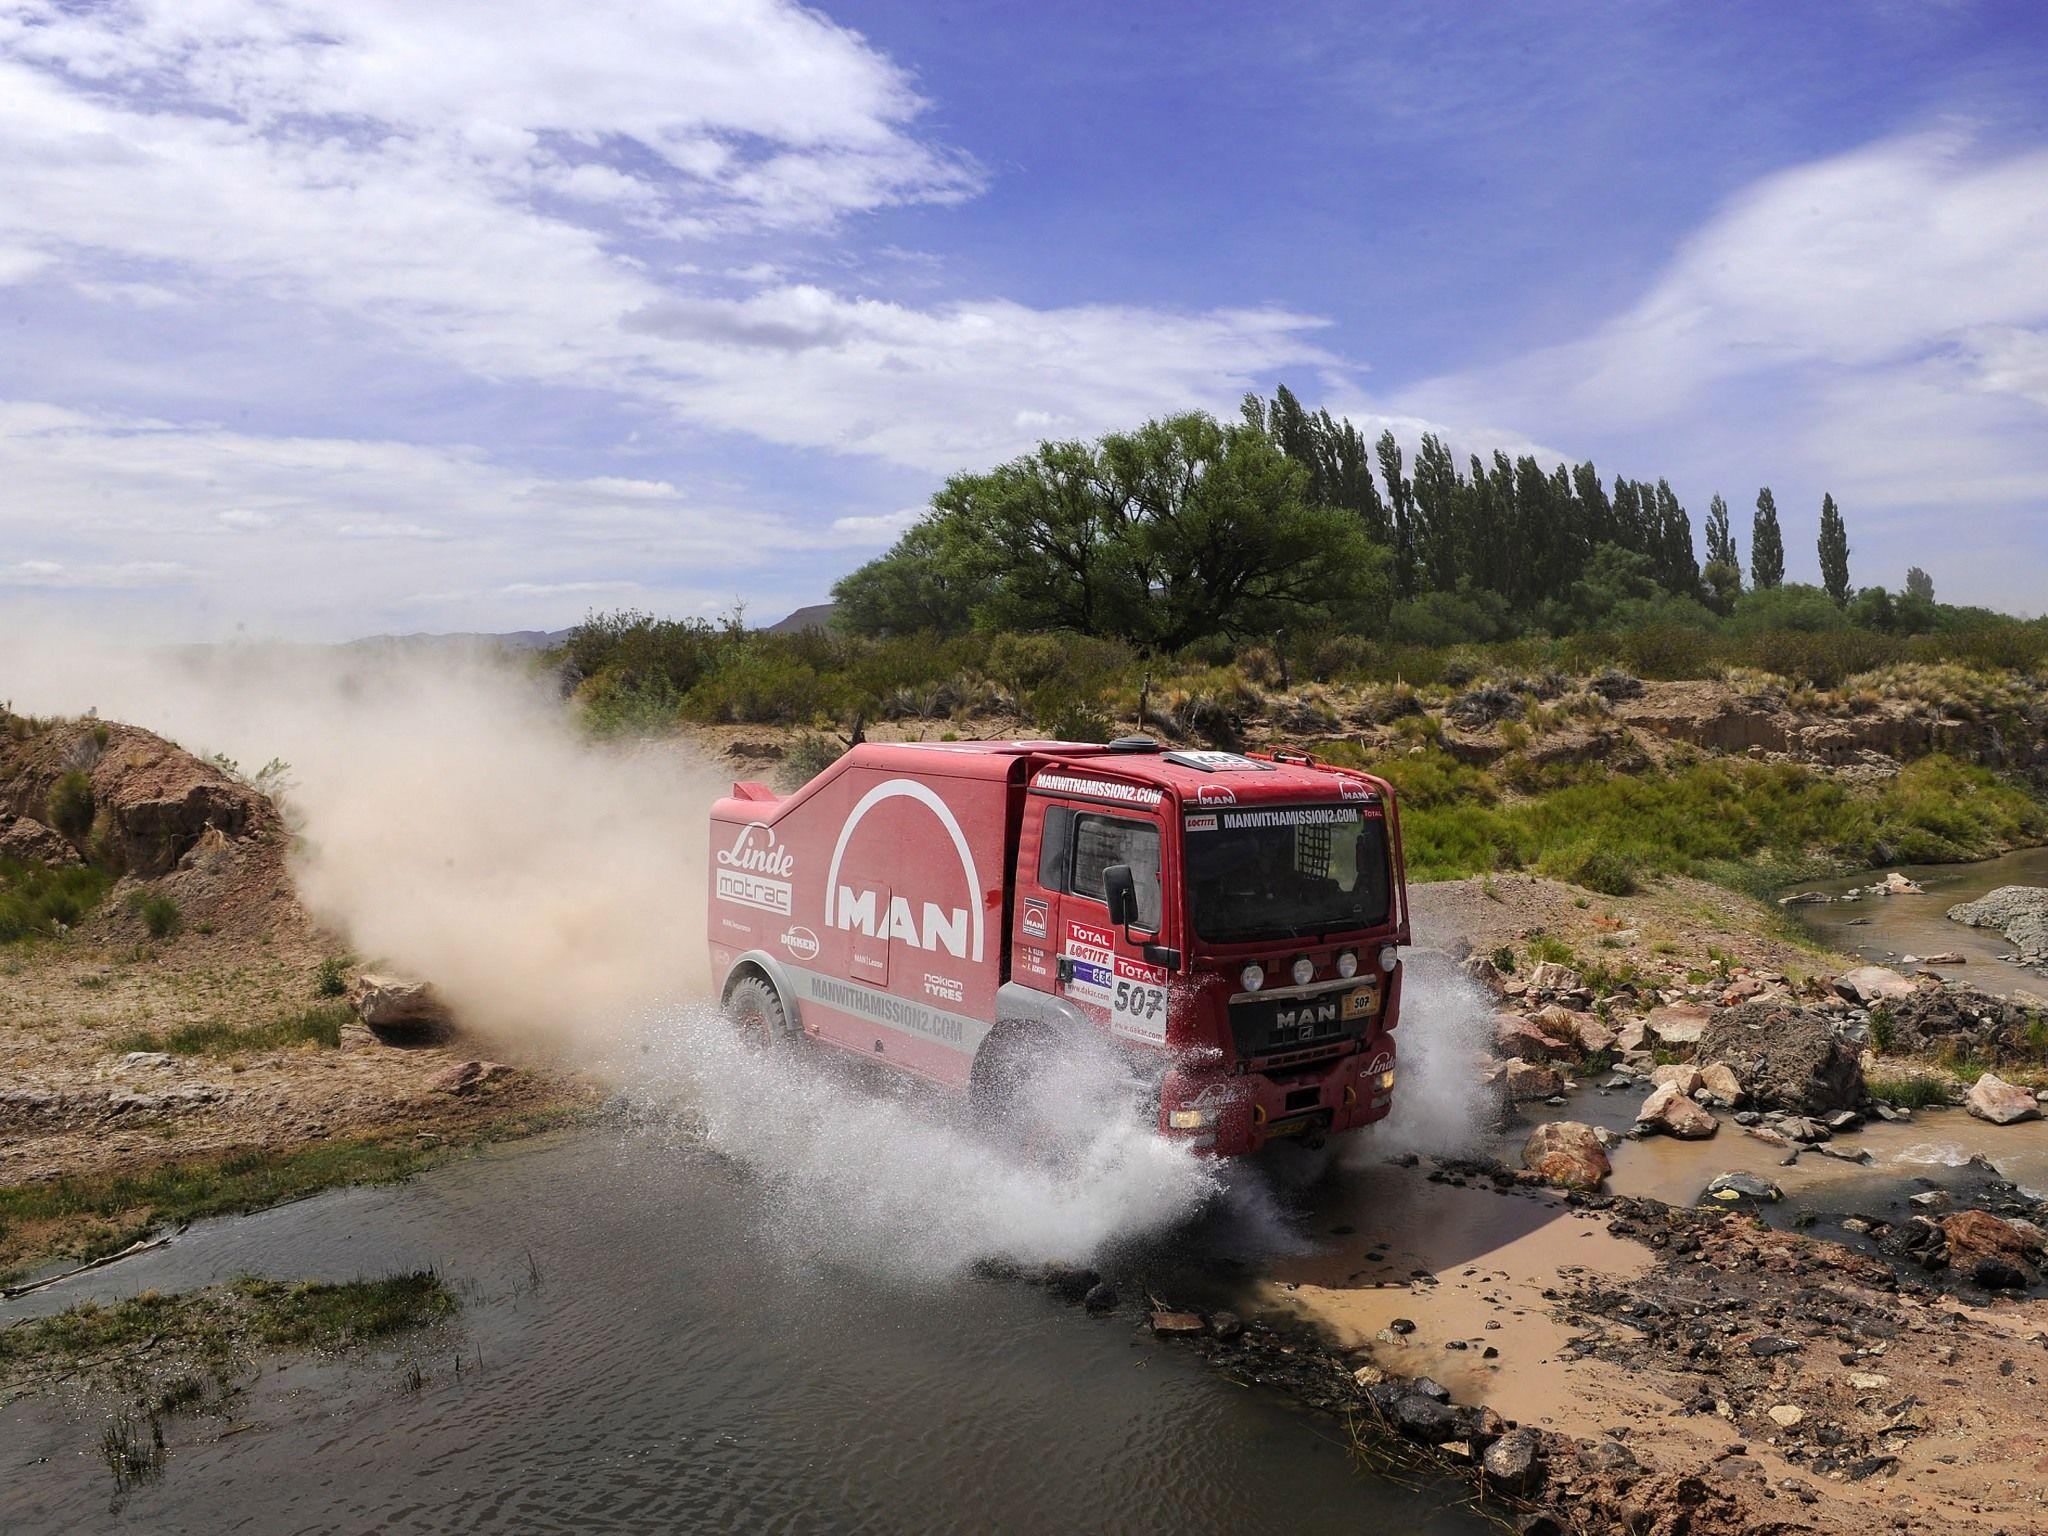 2007 MAN TGS Rally Truck dakar 4x4 offroad race racing fs ...